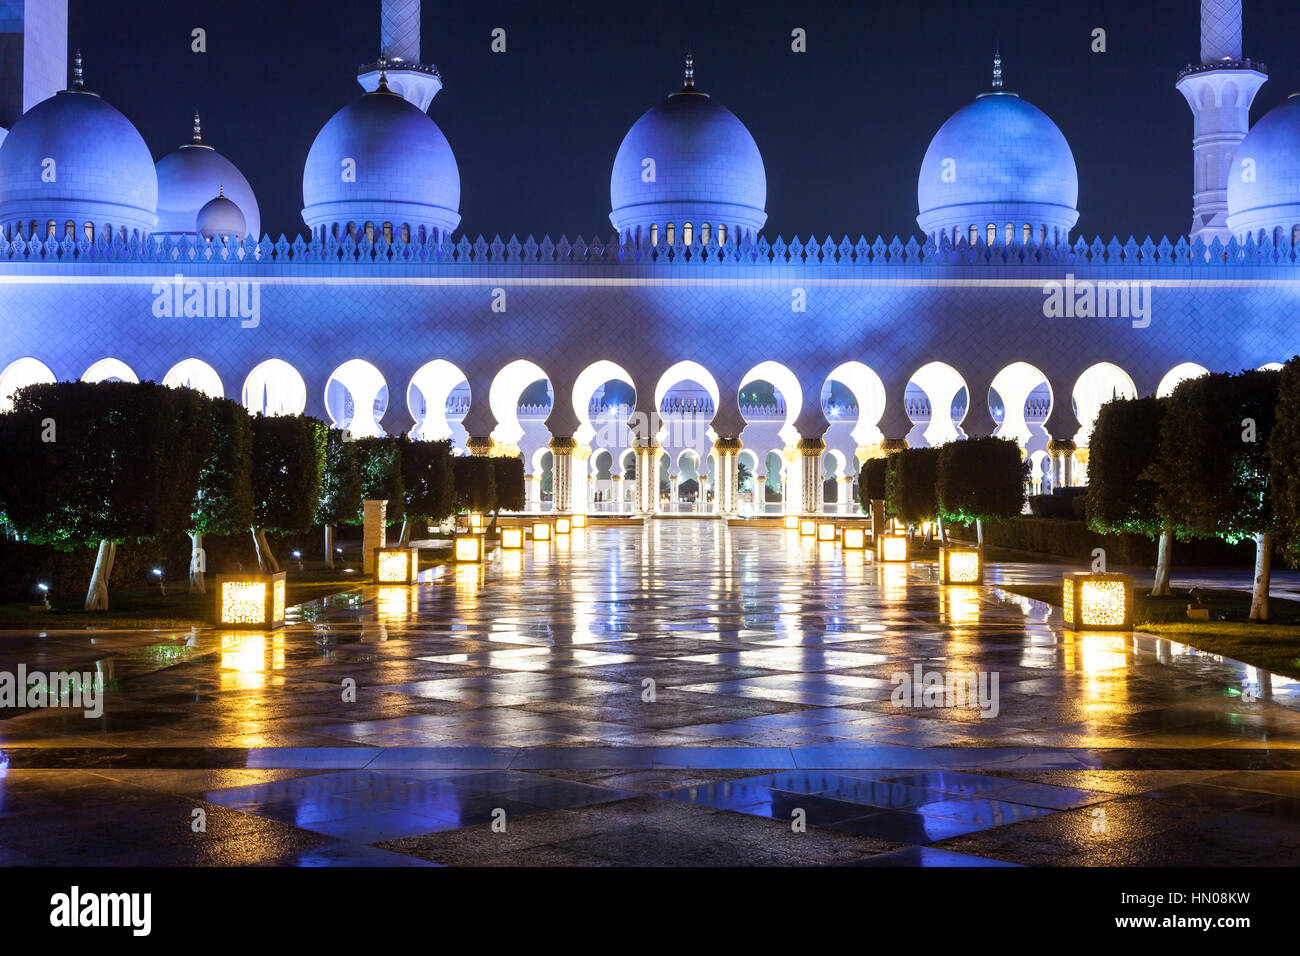 Gran Mezquita de Sheikh Zayed iluminados durante la noche. Abu Dhabi, Emiratos Árabes Unidos, Oriente Medio Imagen De Stock